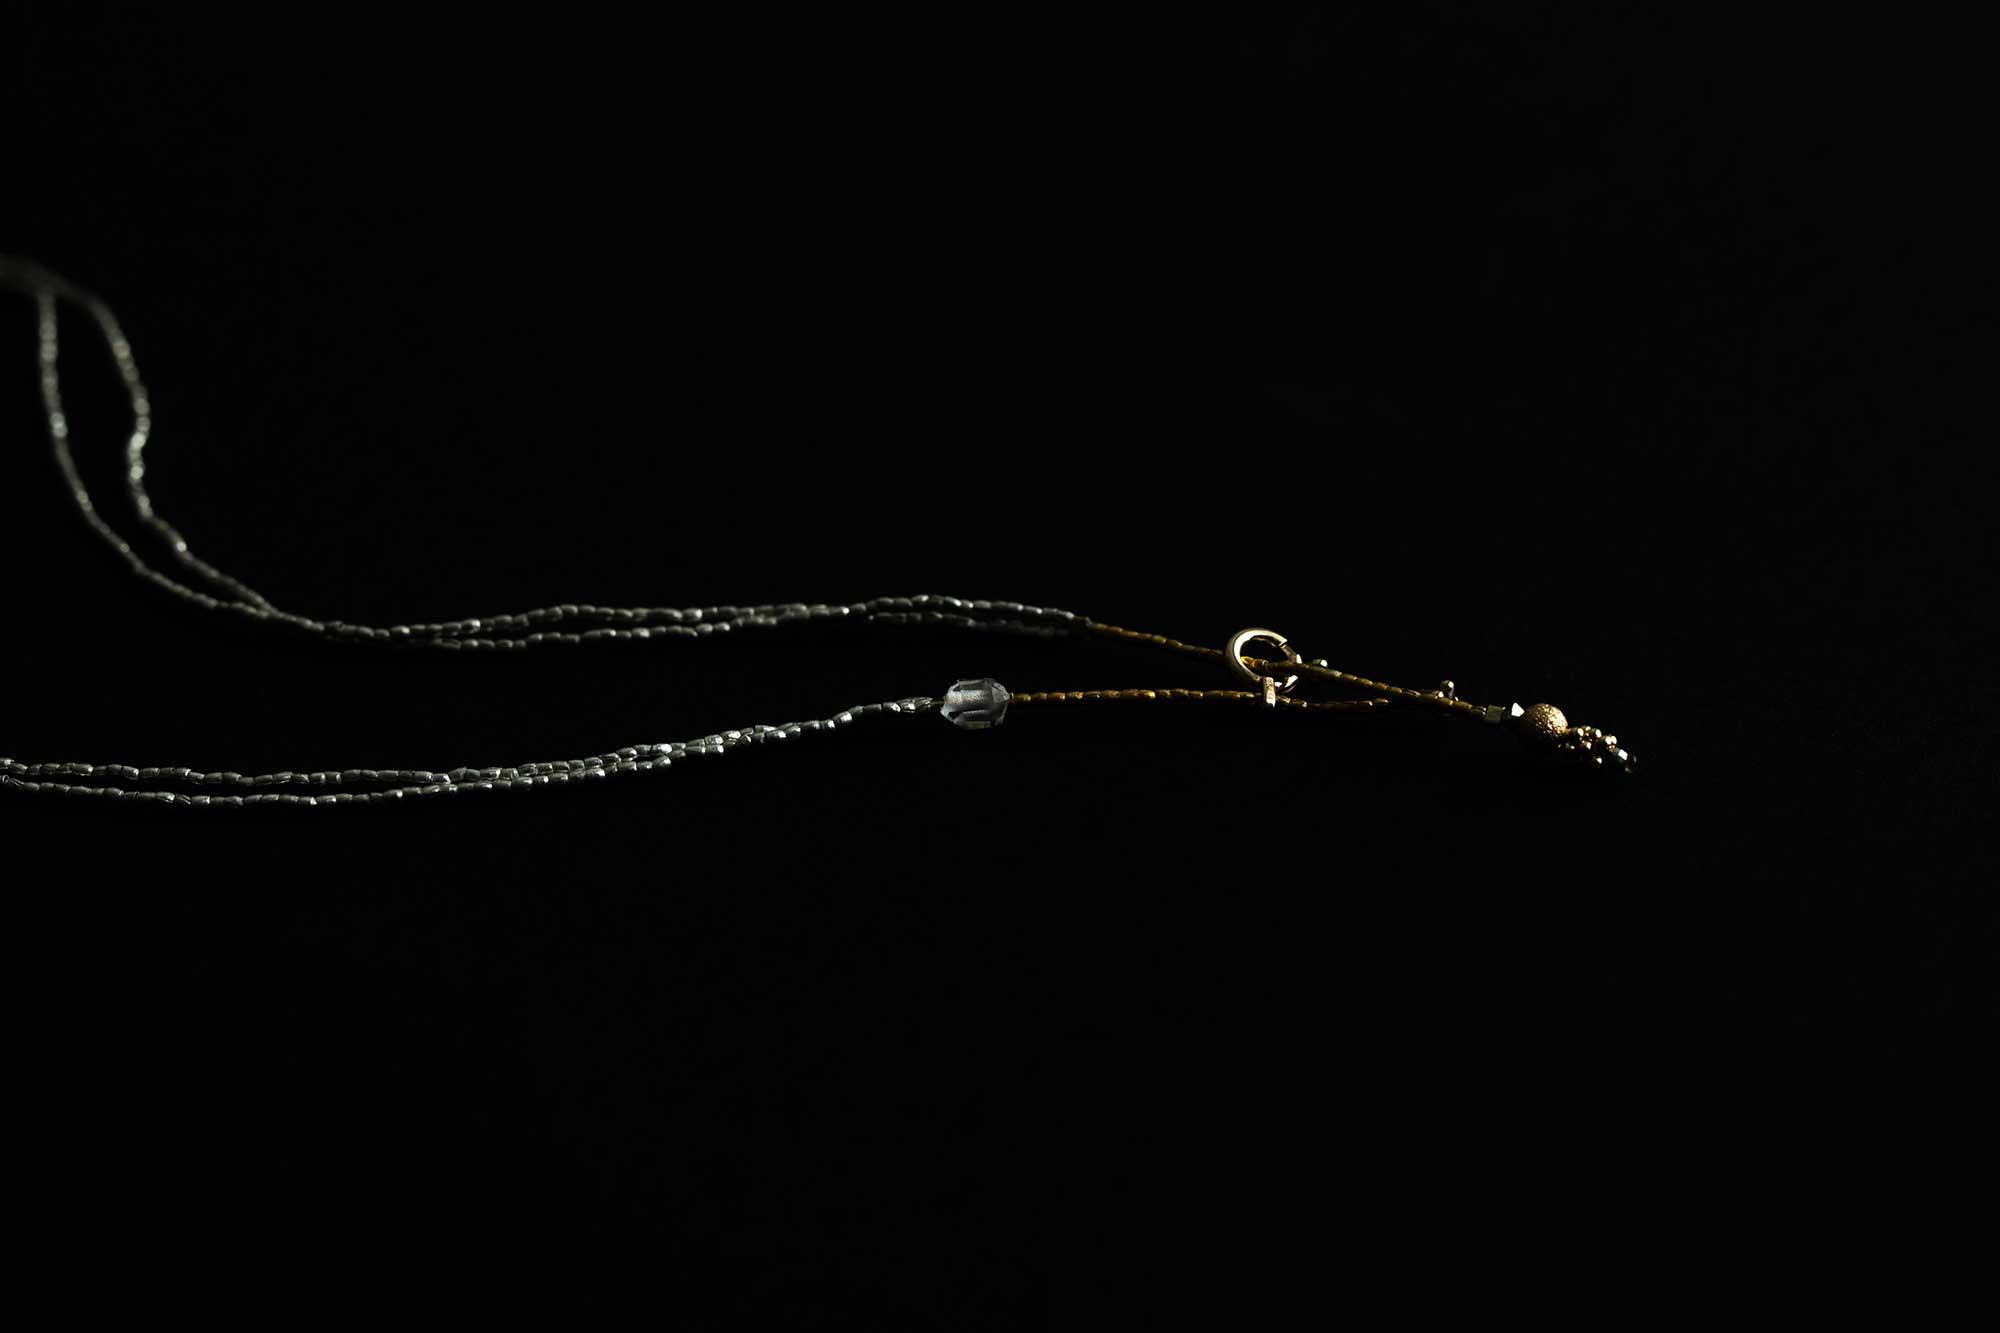 立田暁子 amulet necklace 35cm